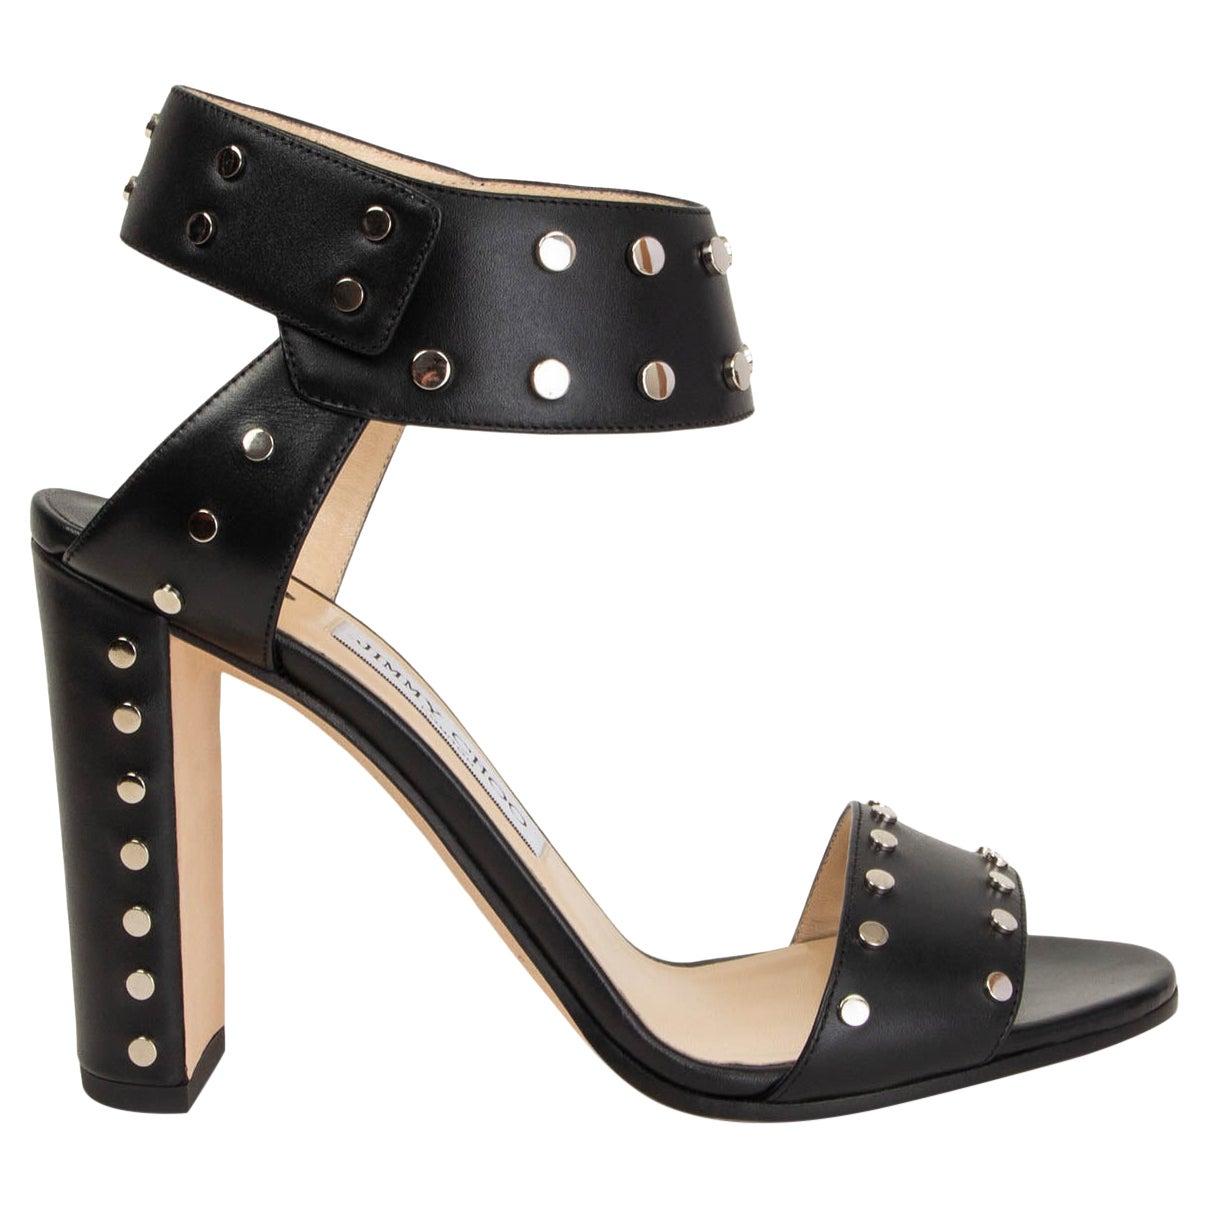 JIMMY CHOO black leather STUDDED VETO 100 Sandals Shoes 39